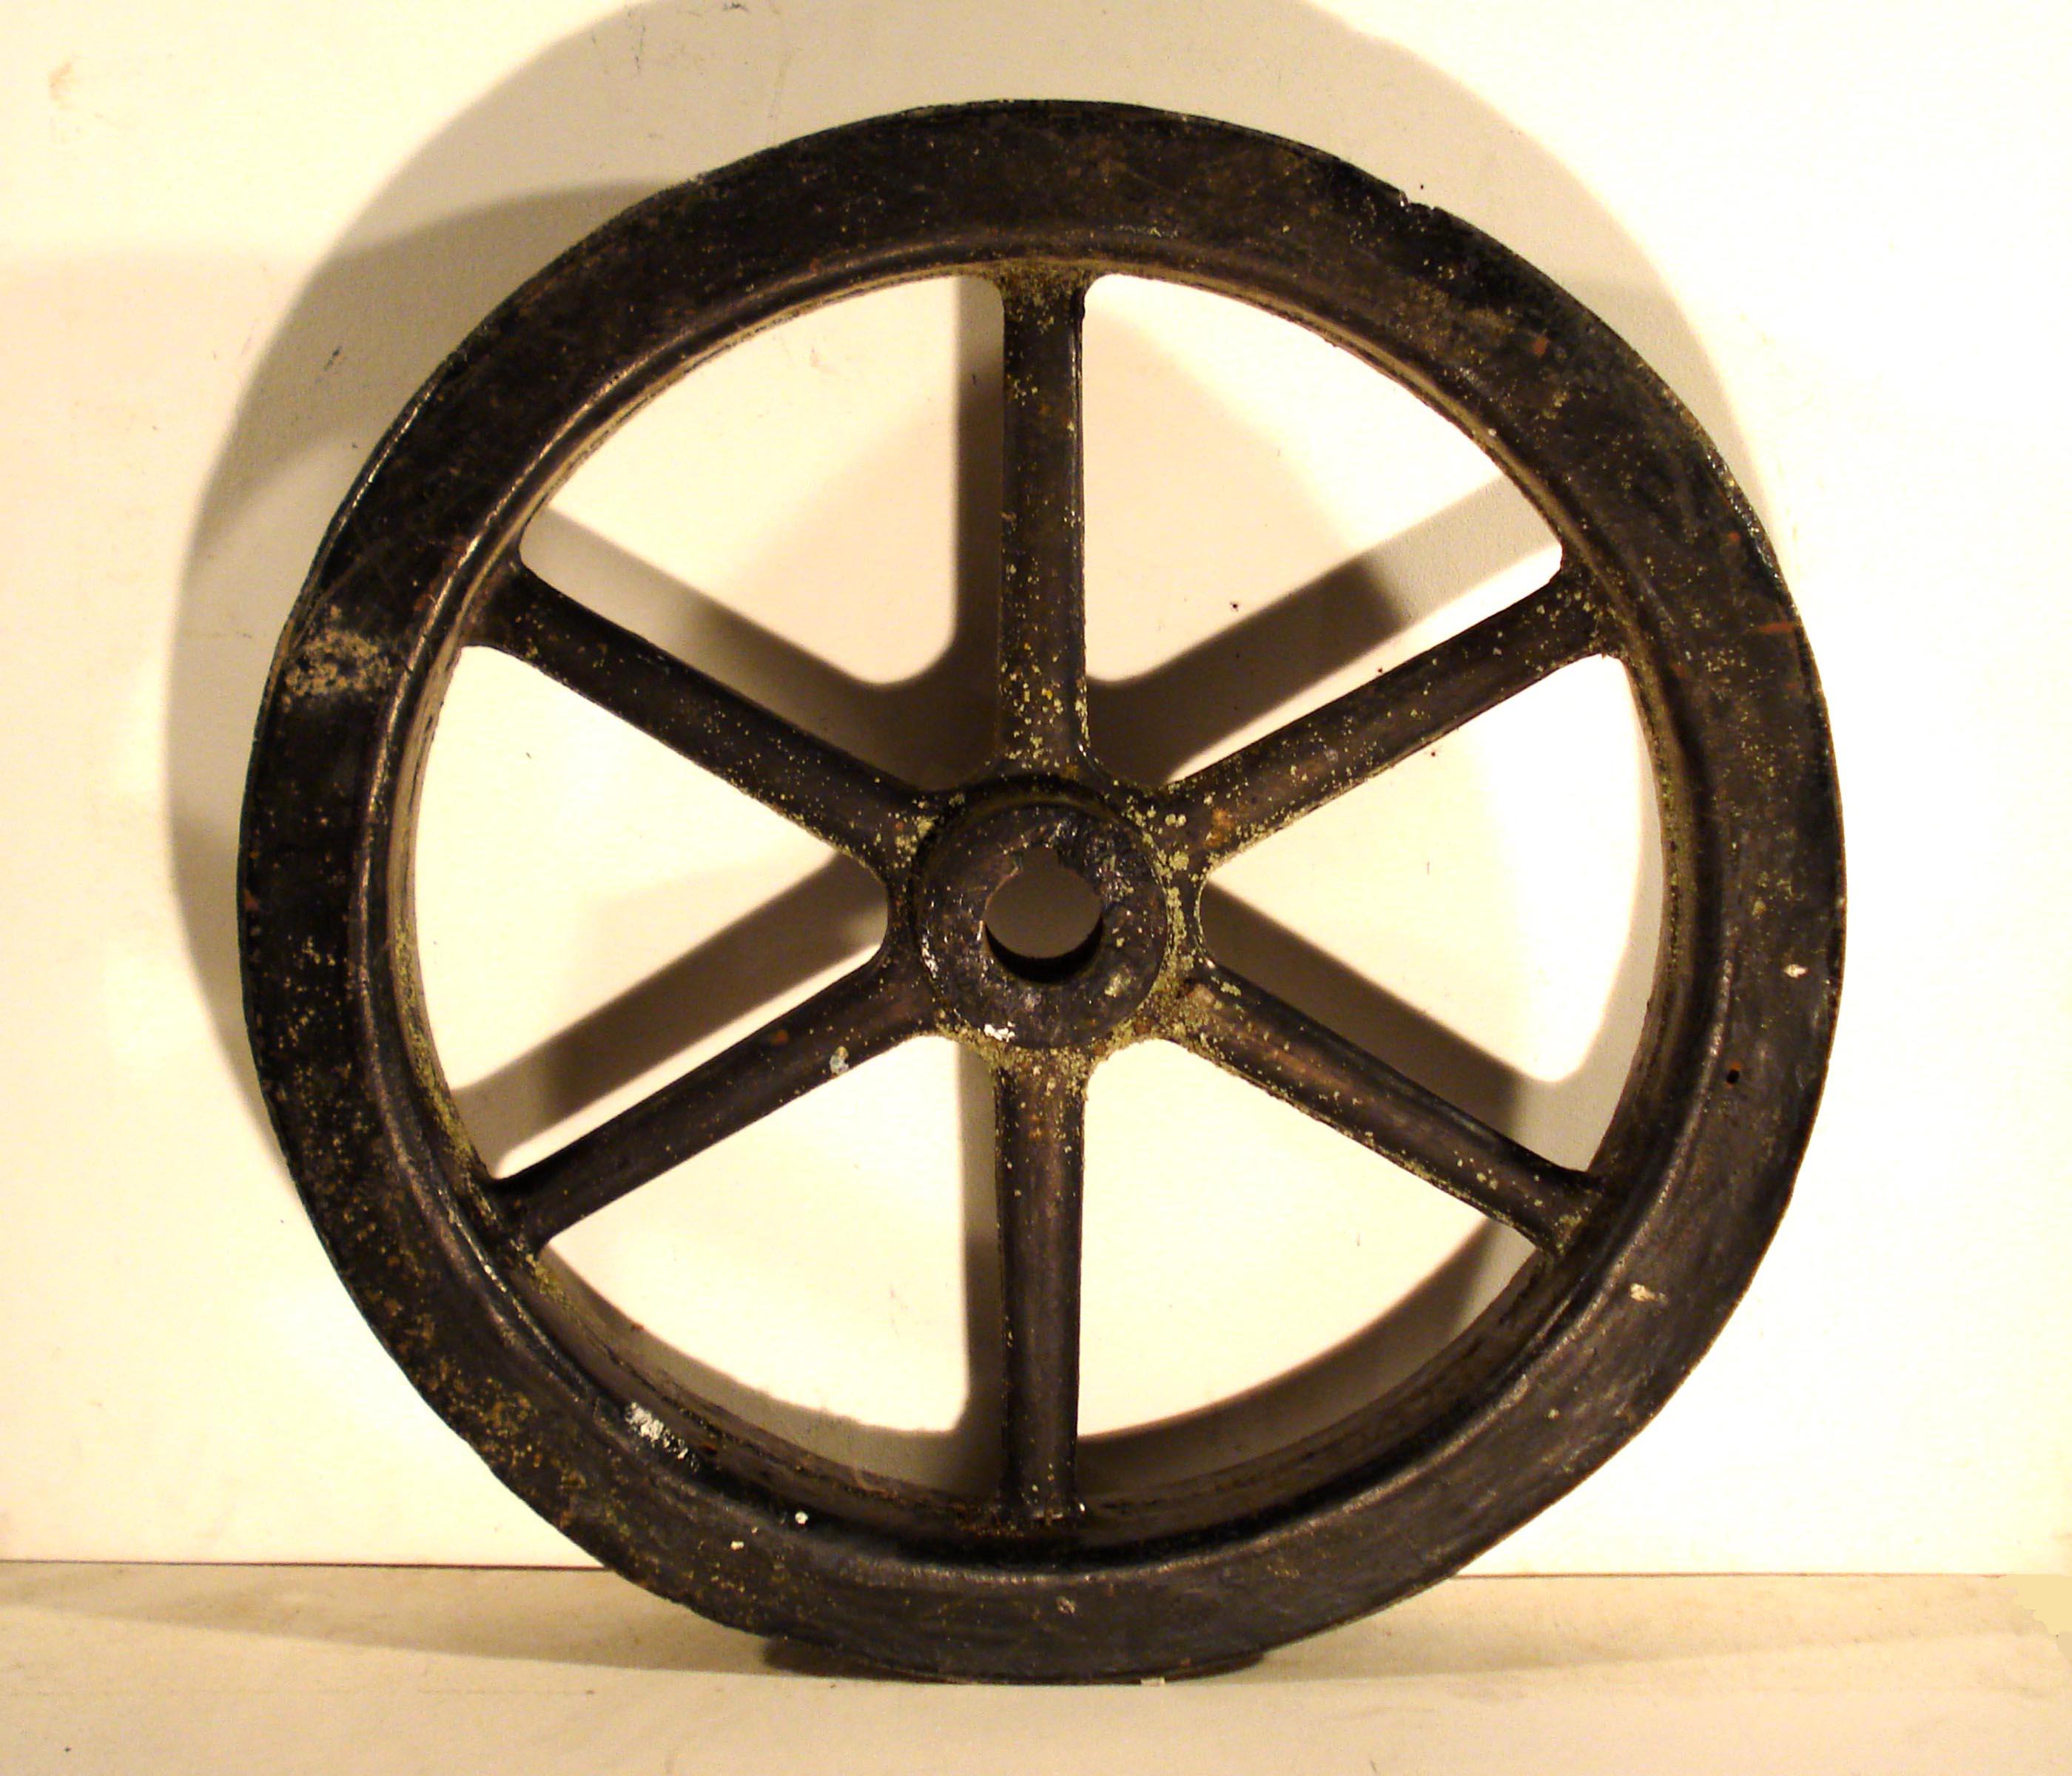 La roue - René François Sully Prudhomme Steel_wheel_industrial_old_style